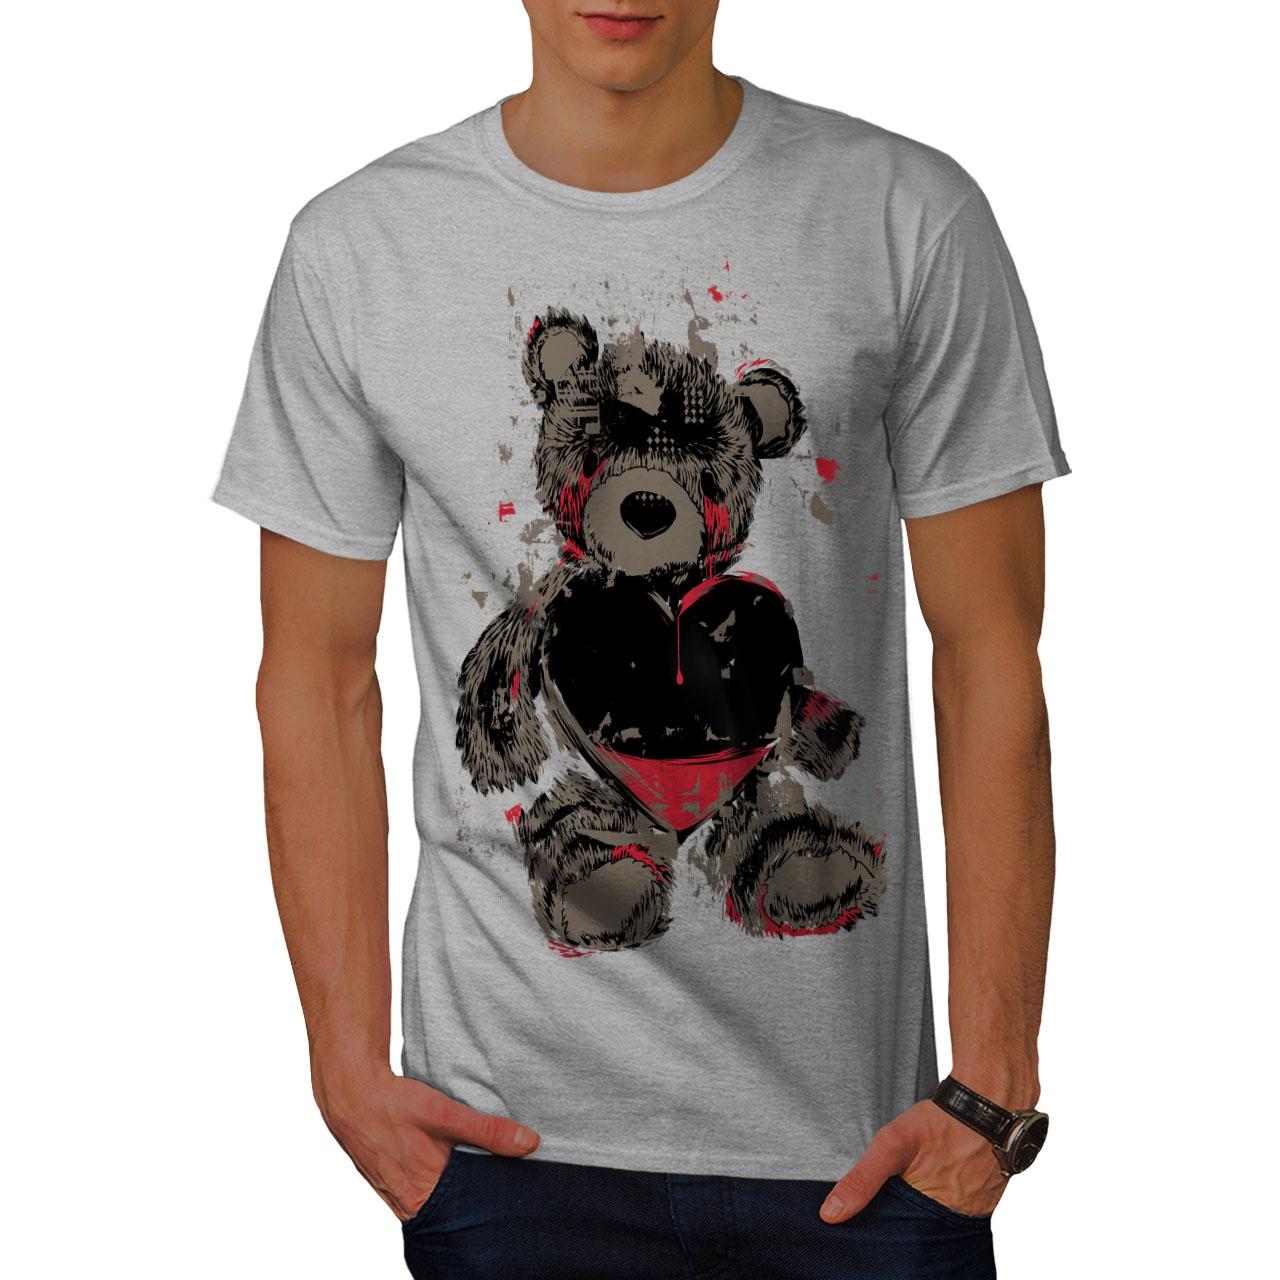 miniature 15 - Wellcoda Teddy Bear Love Hurt Mens T-shirt, Blood Graphic Design Printed Tee